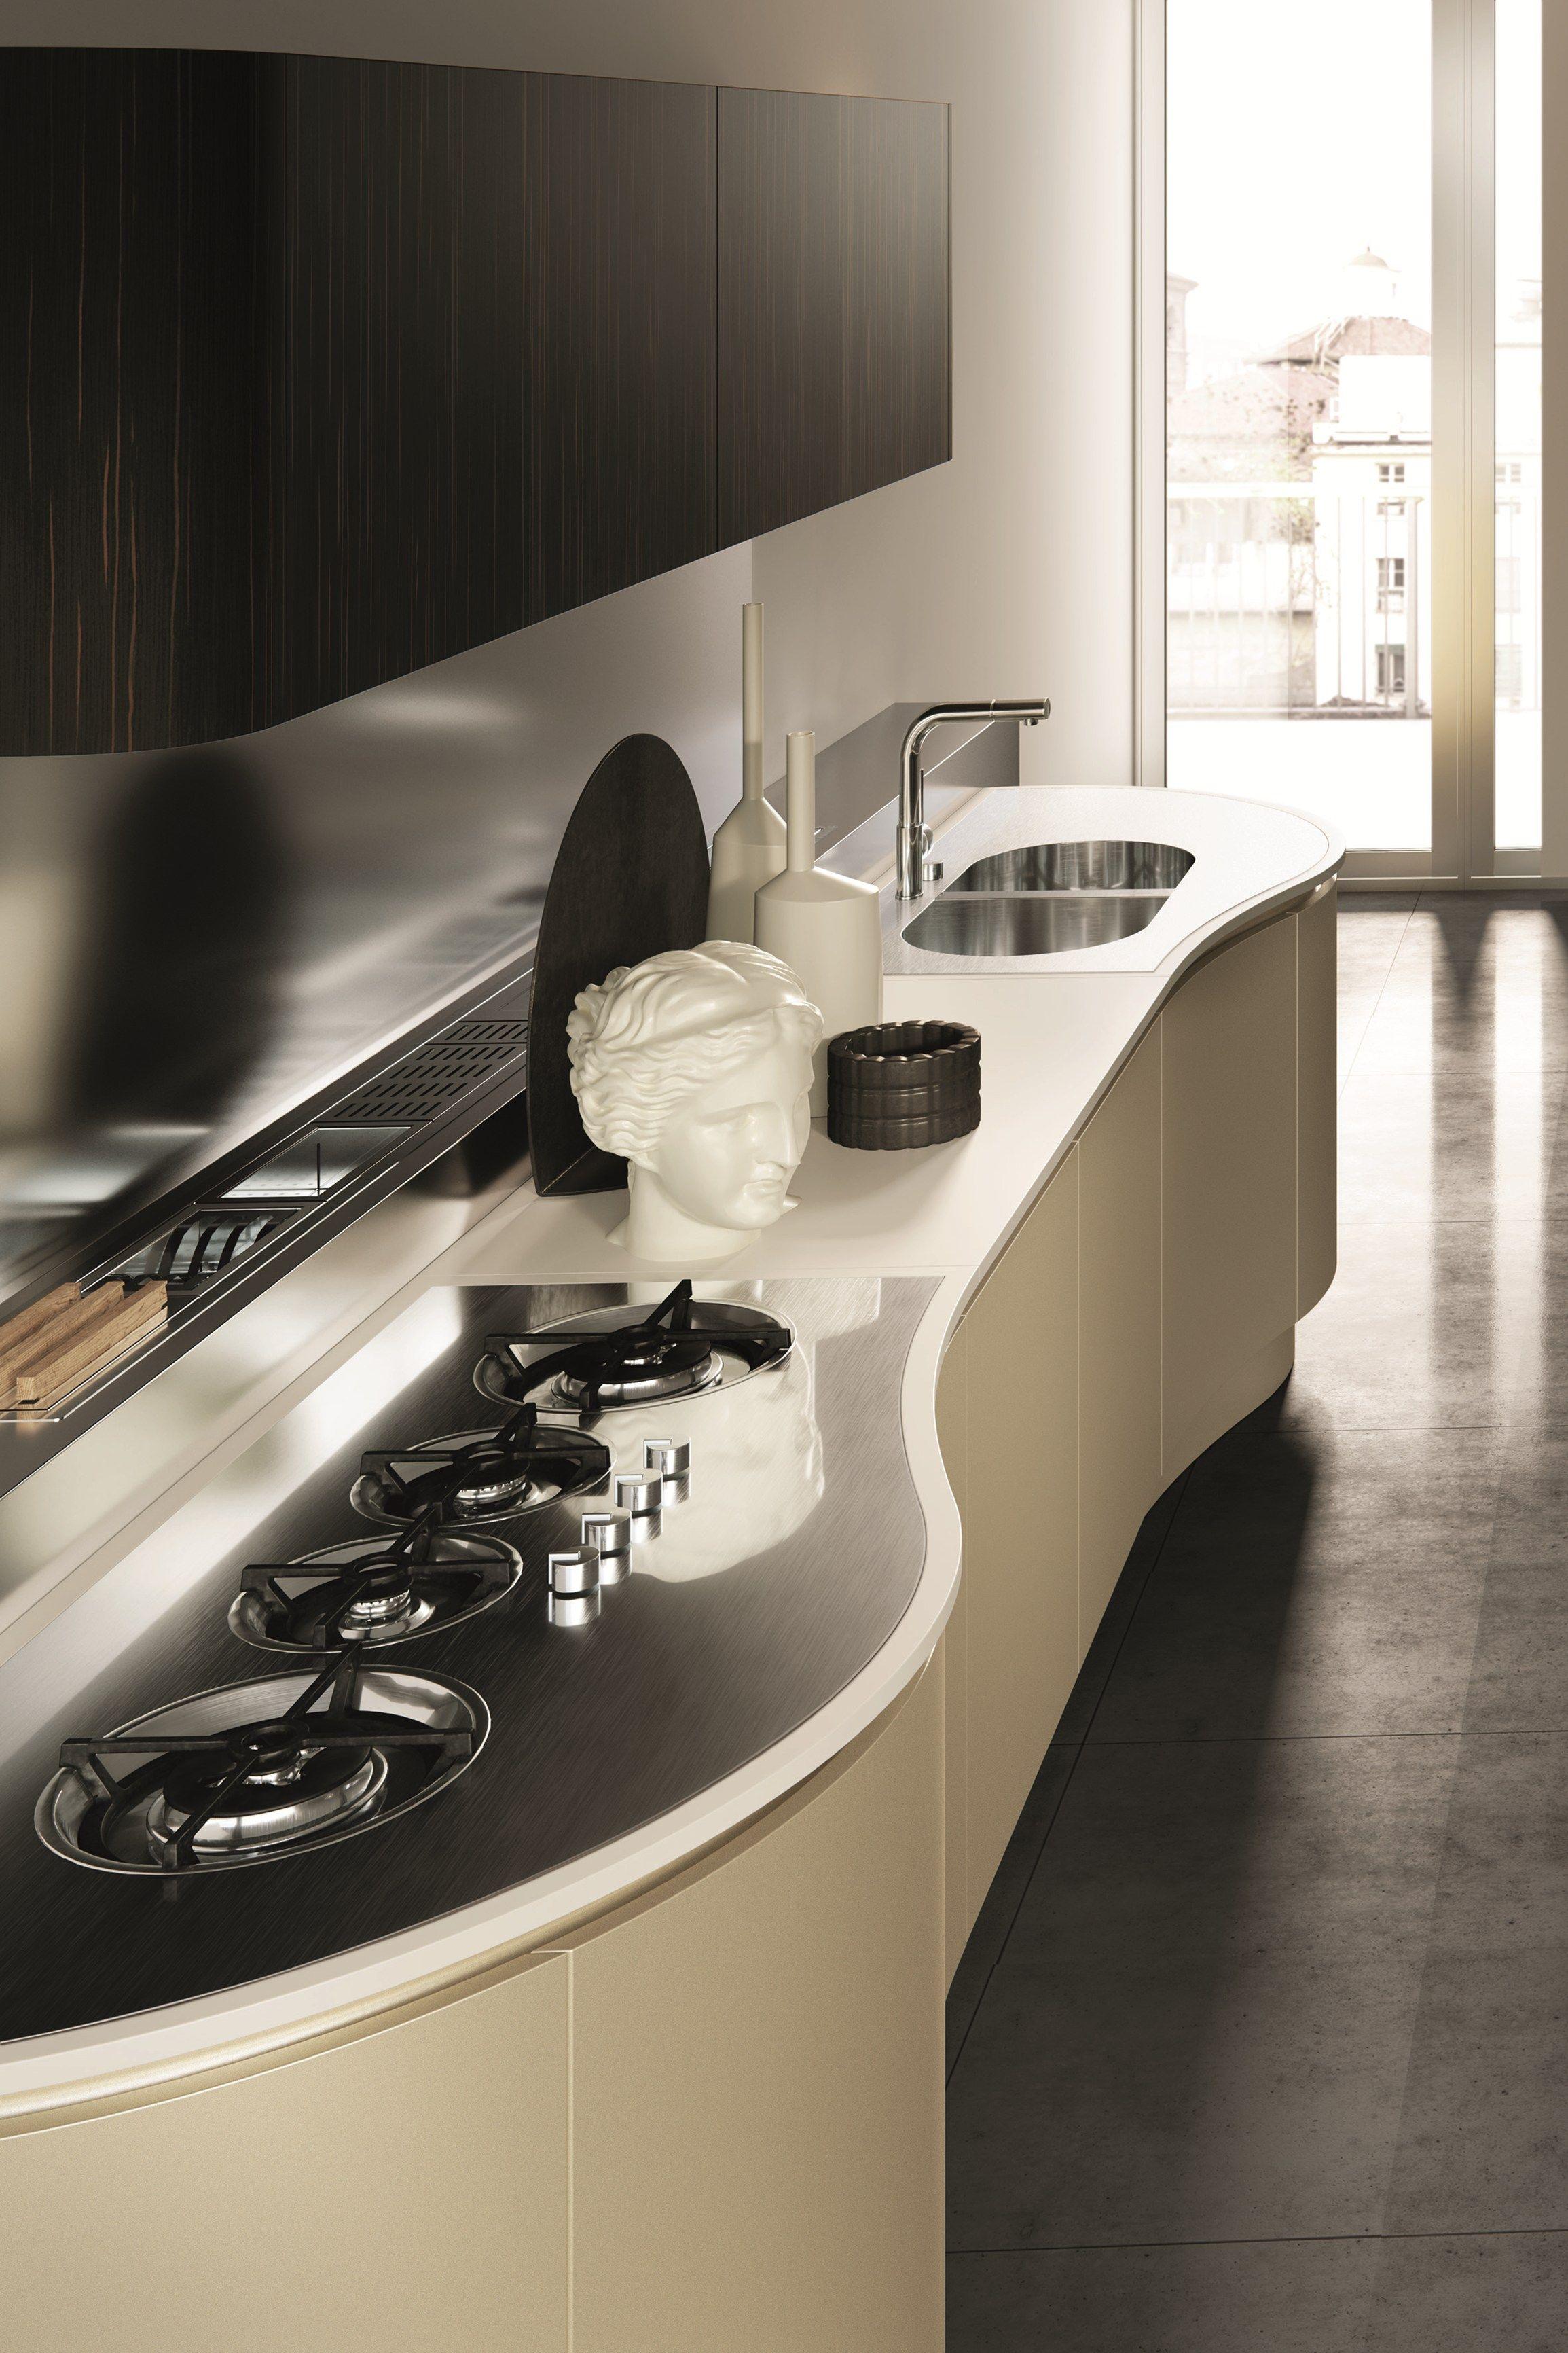 domina linear kitchen by aster cucine design lorenzo granocchia